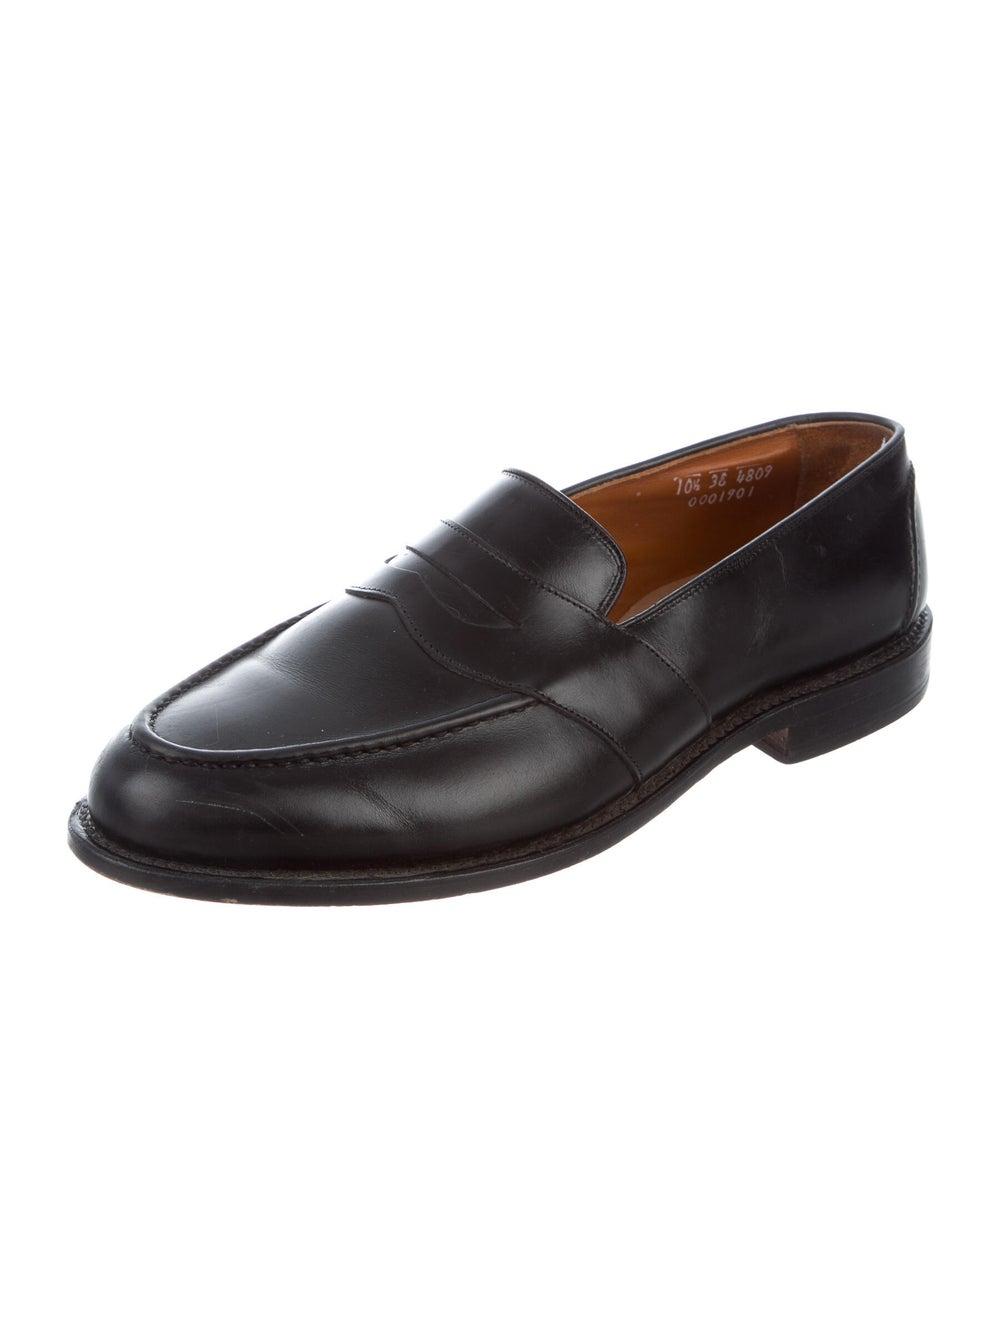 Allen Edmonds Leather Penny Loafers black - image 2